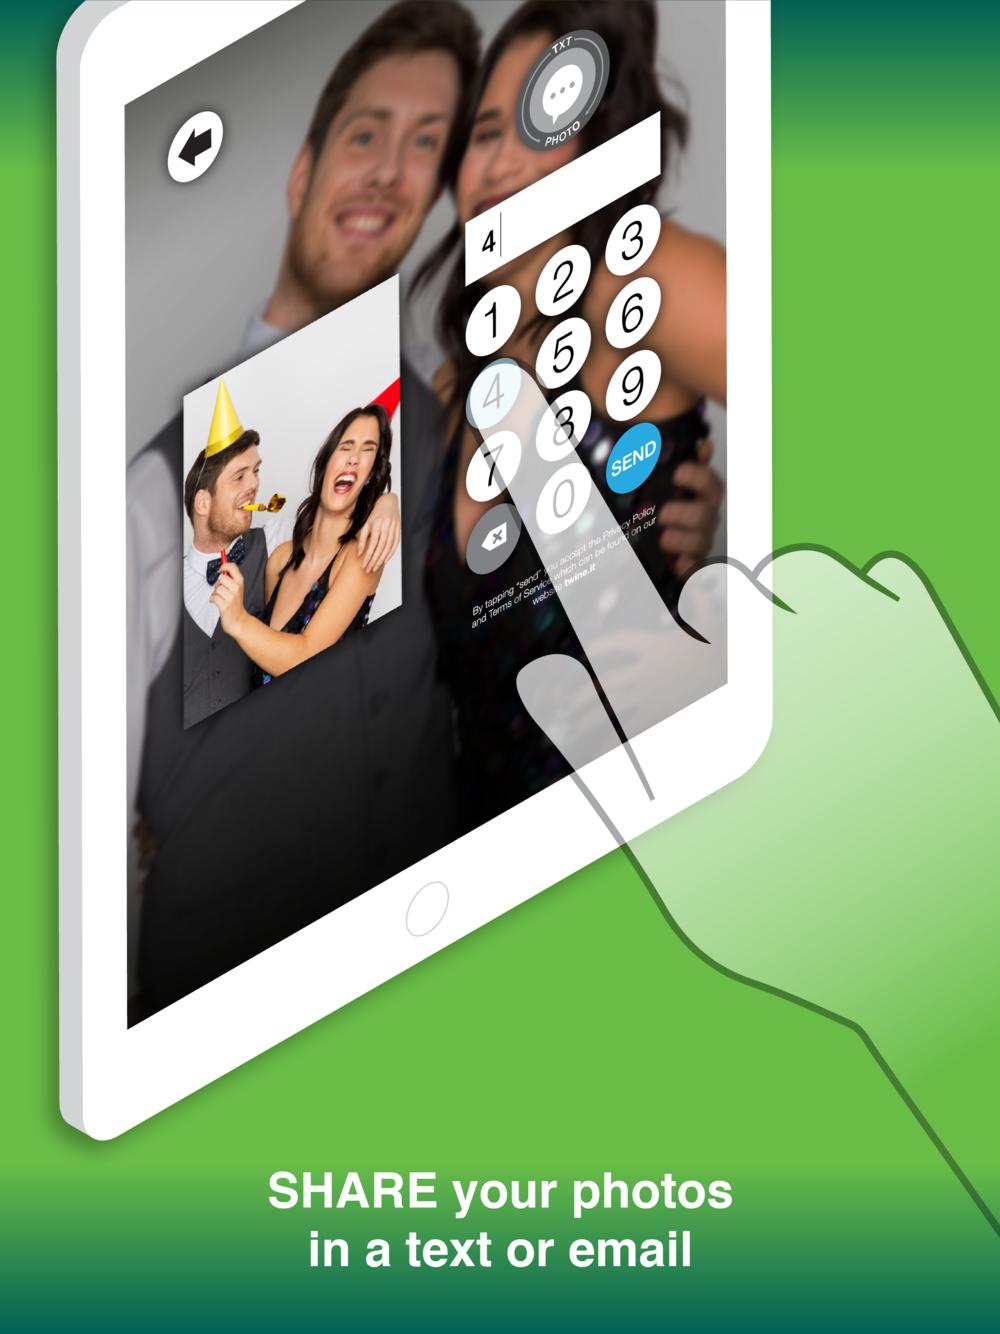 STUDIO App Store_slide 2.png